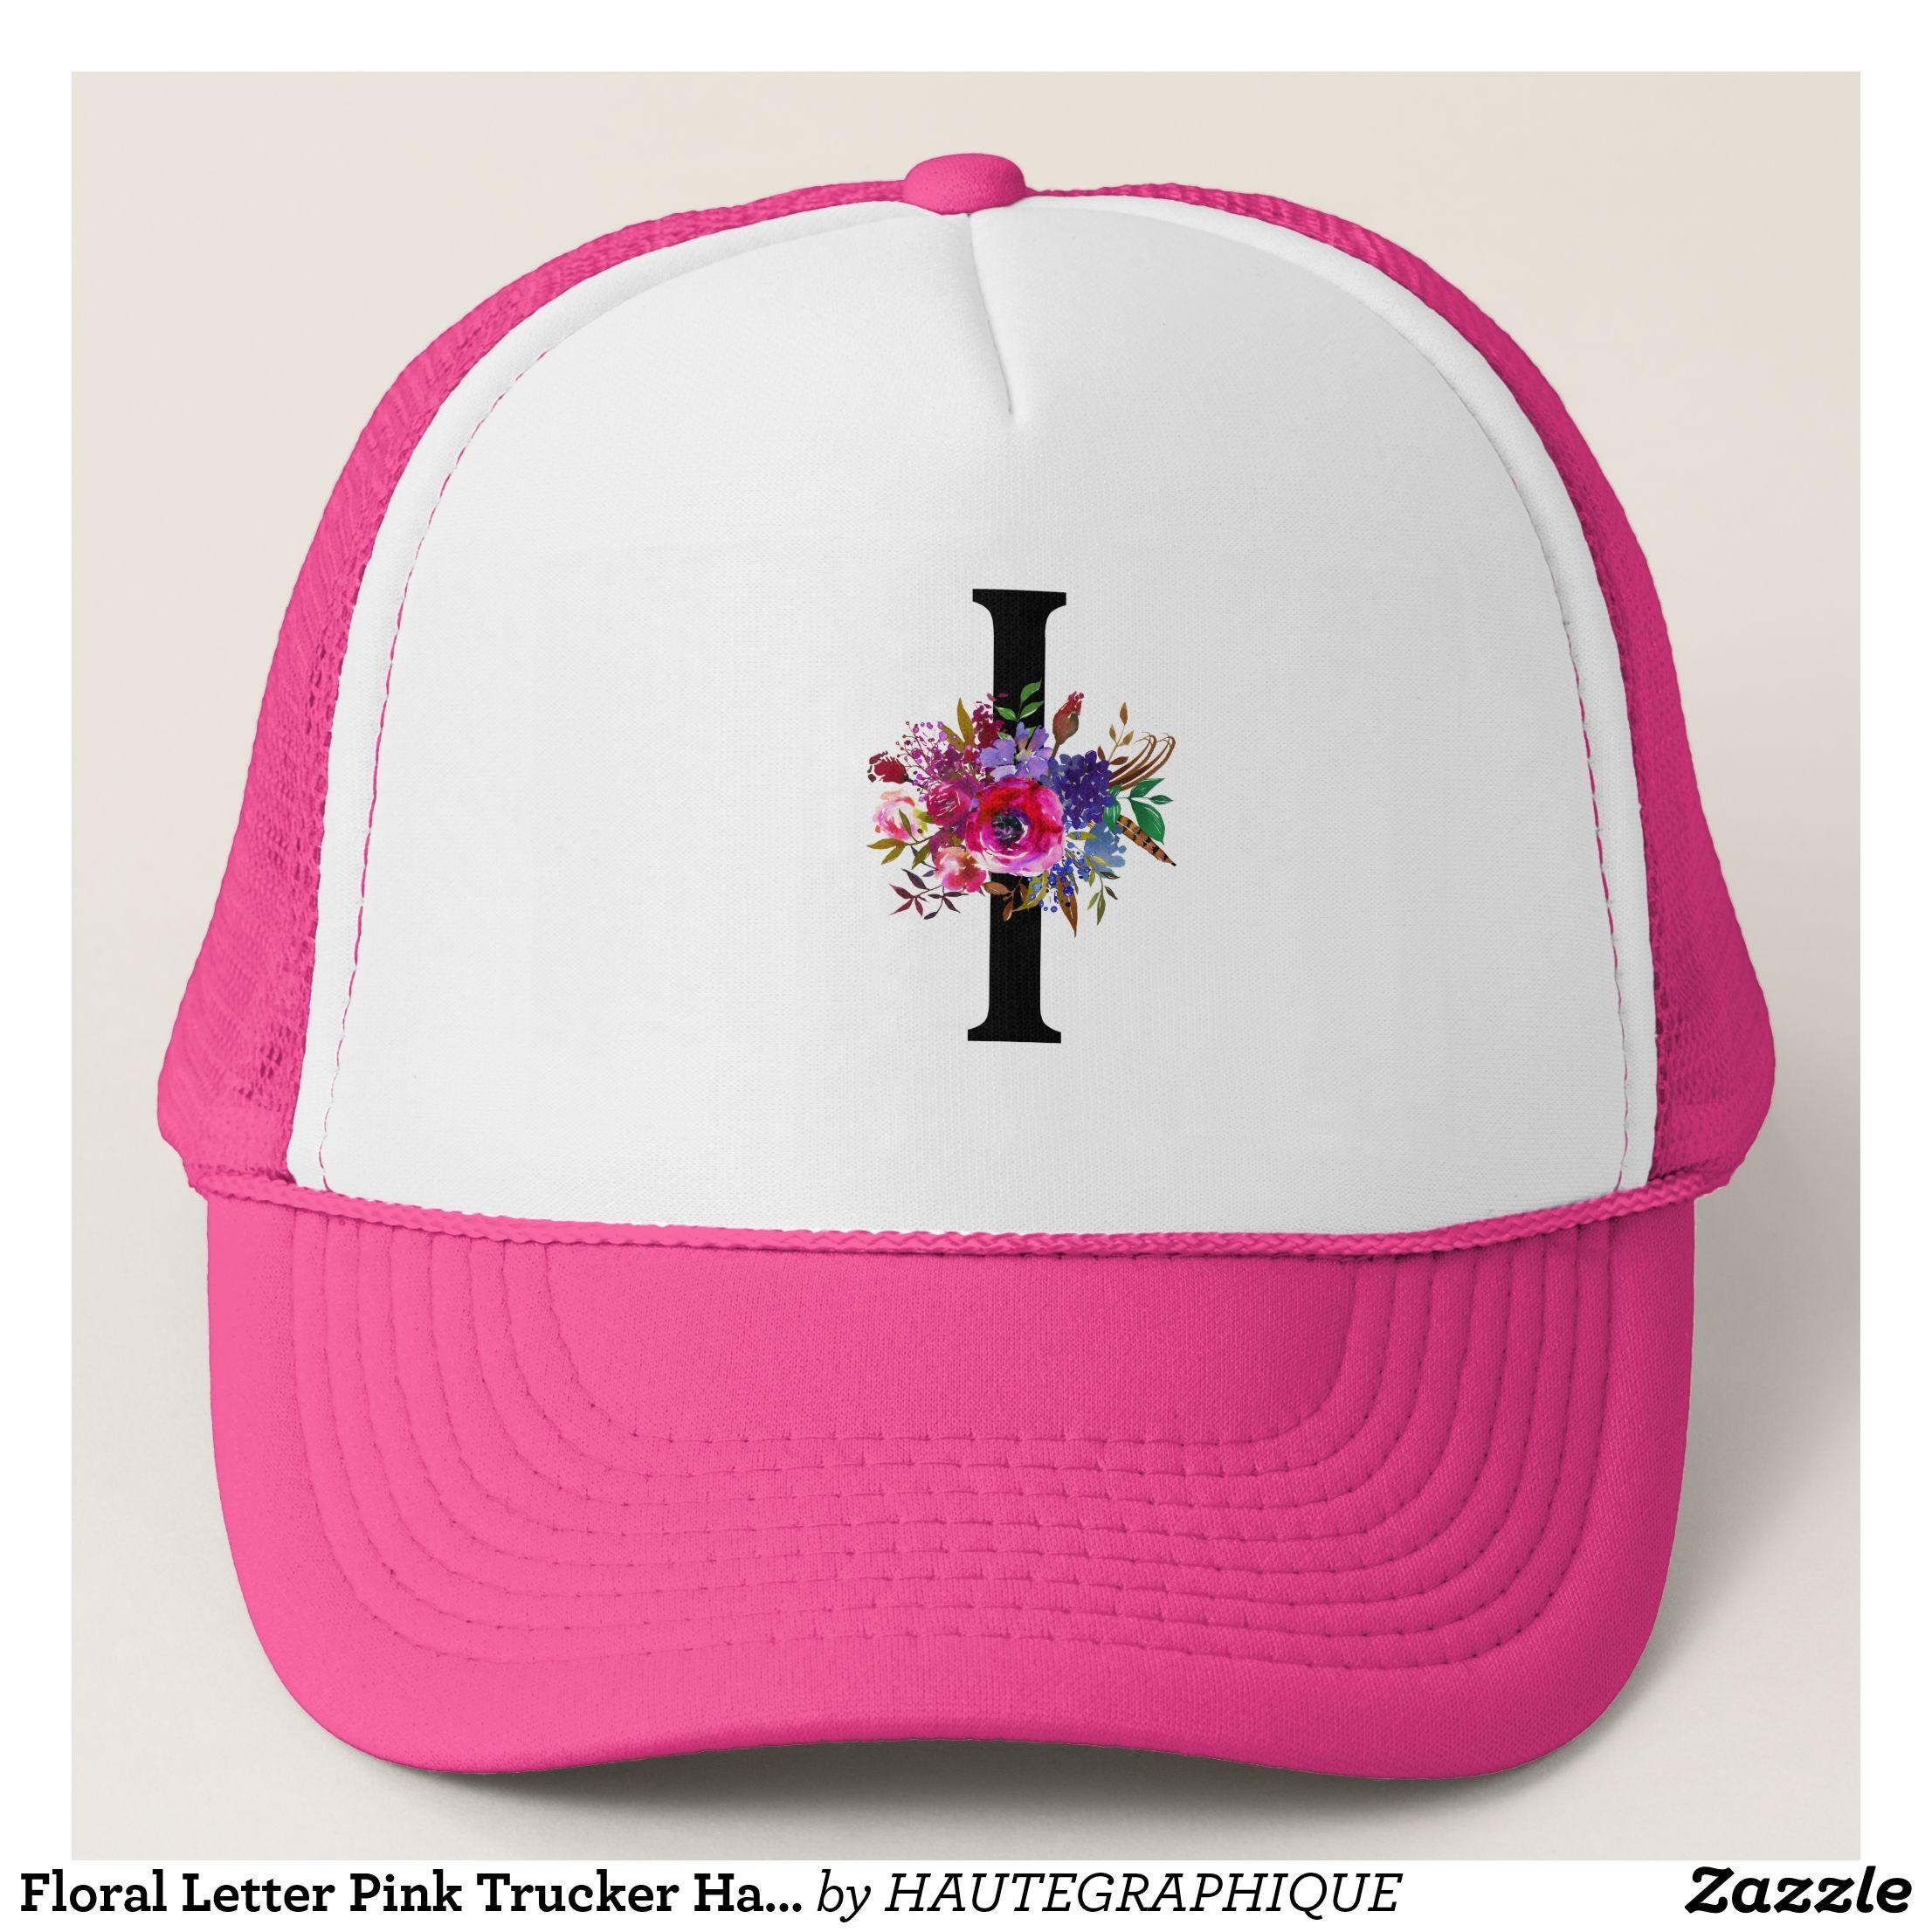 Floral Letter Pink Trucker Hat Wedding Zazzle Com Pink Trucker Hat Trucker Hat Floral Letters